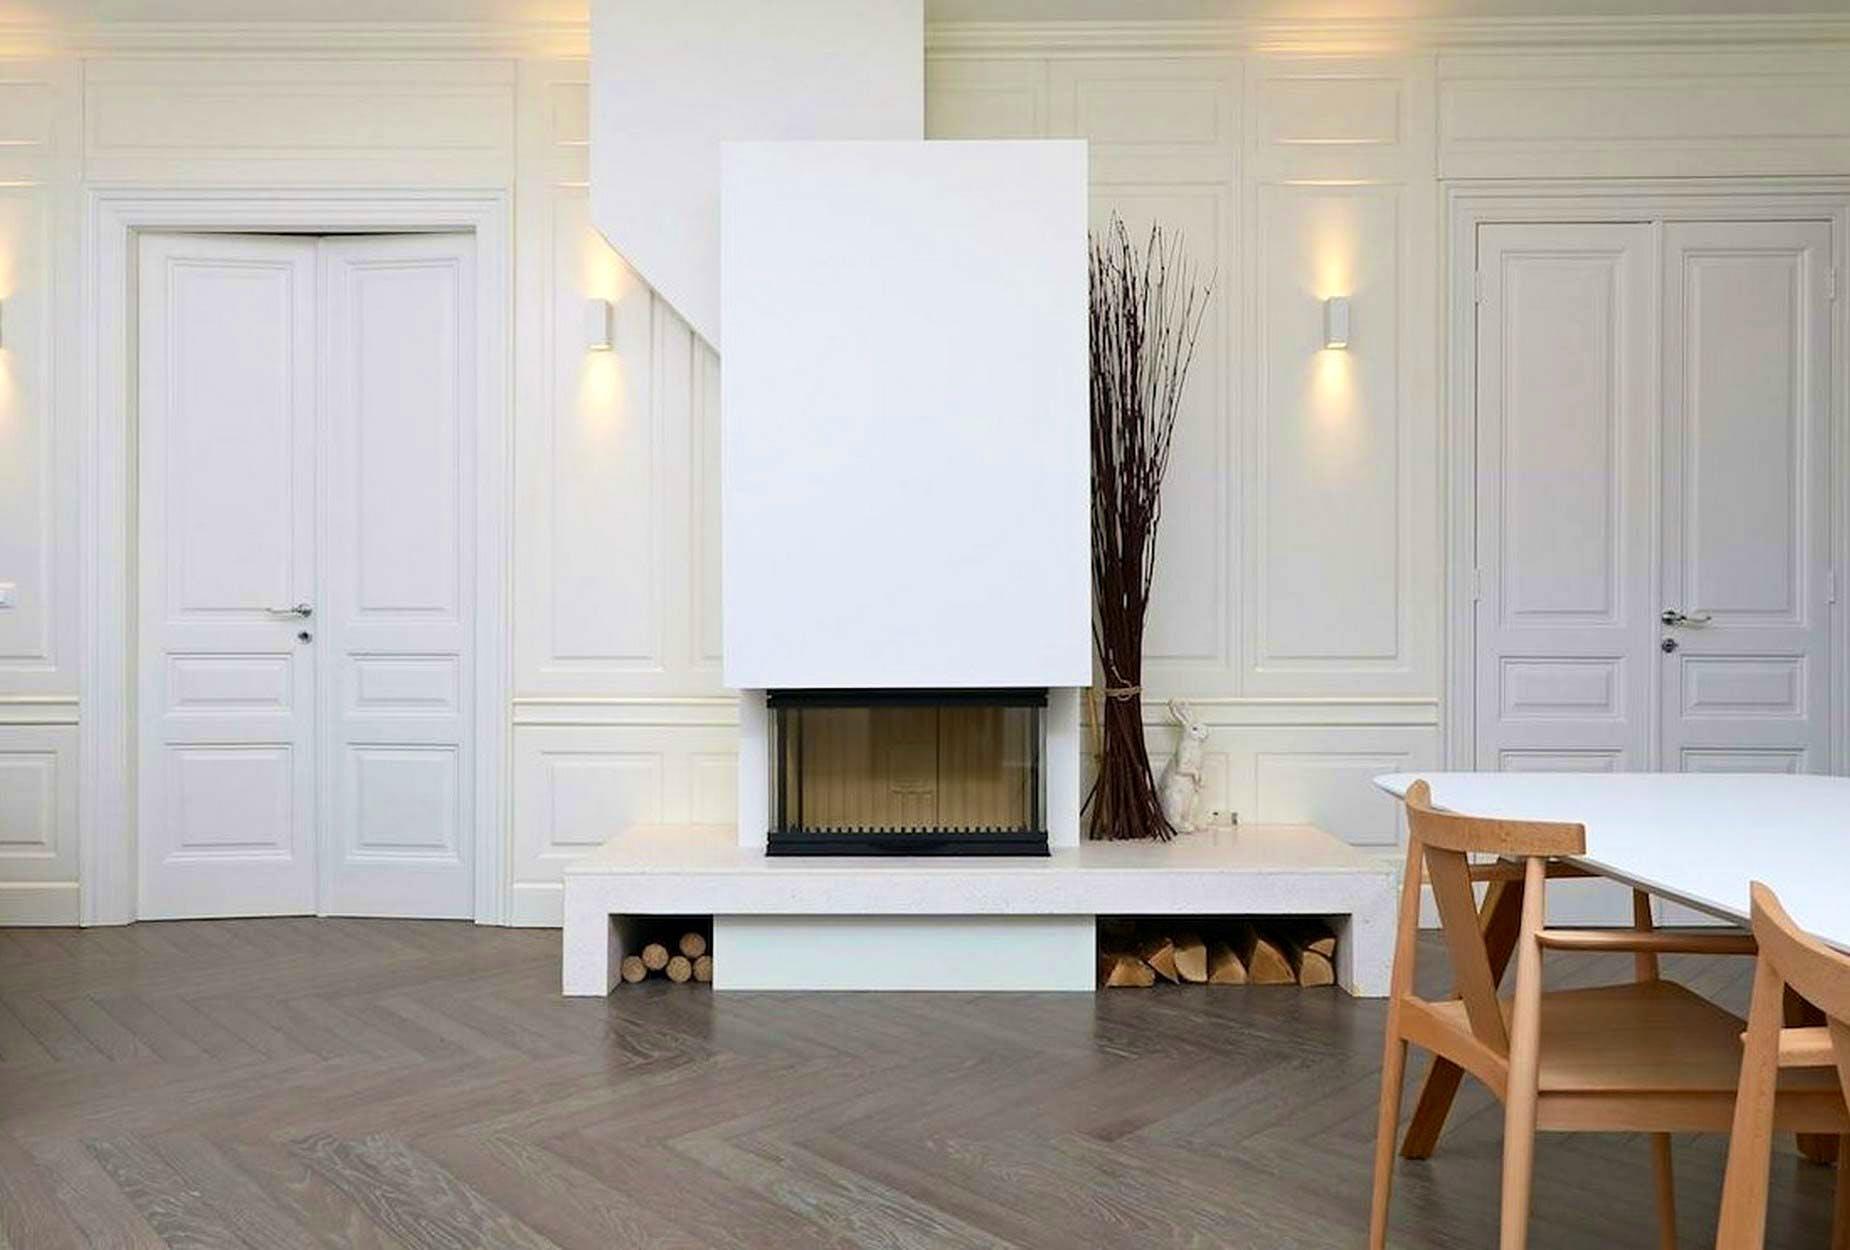 Amazing white fireplace